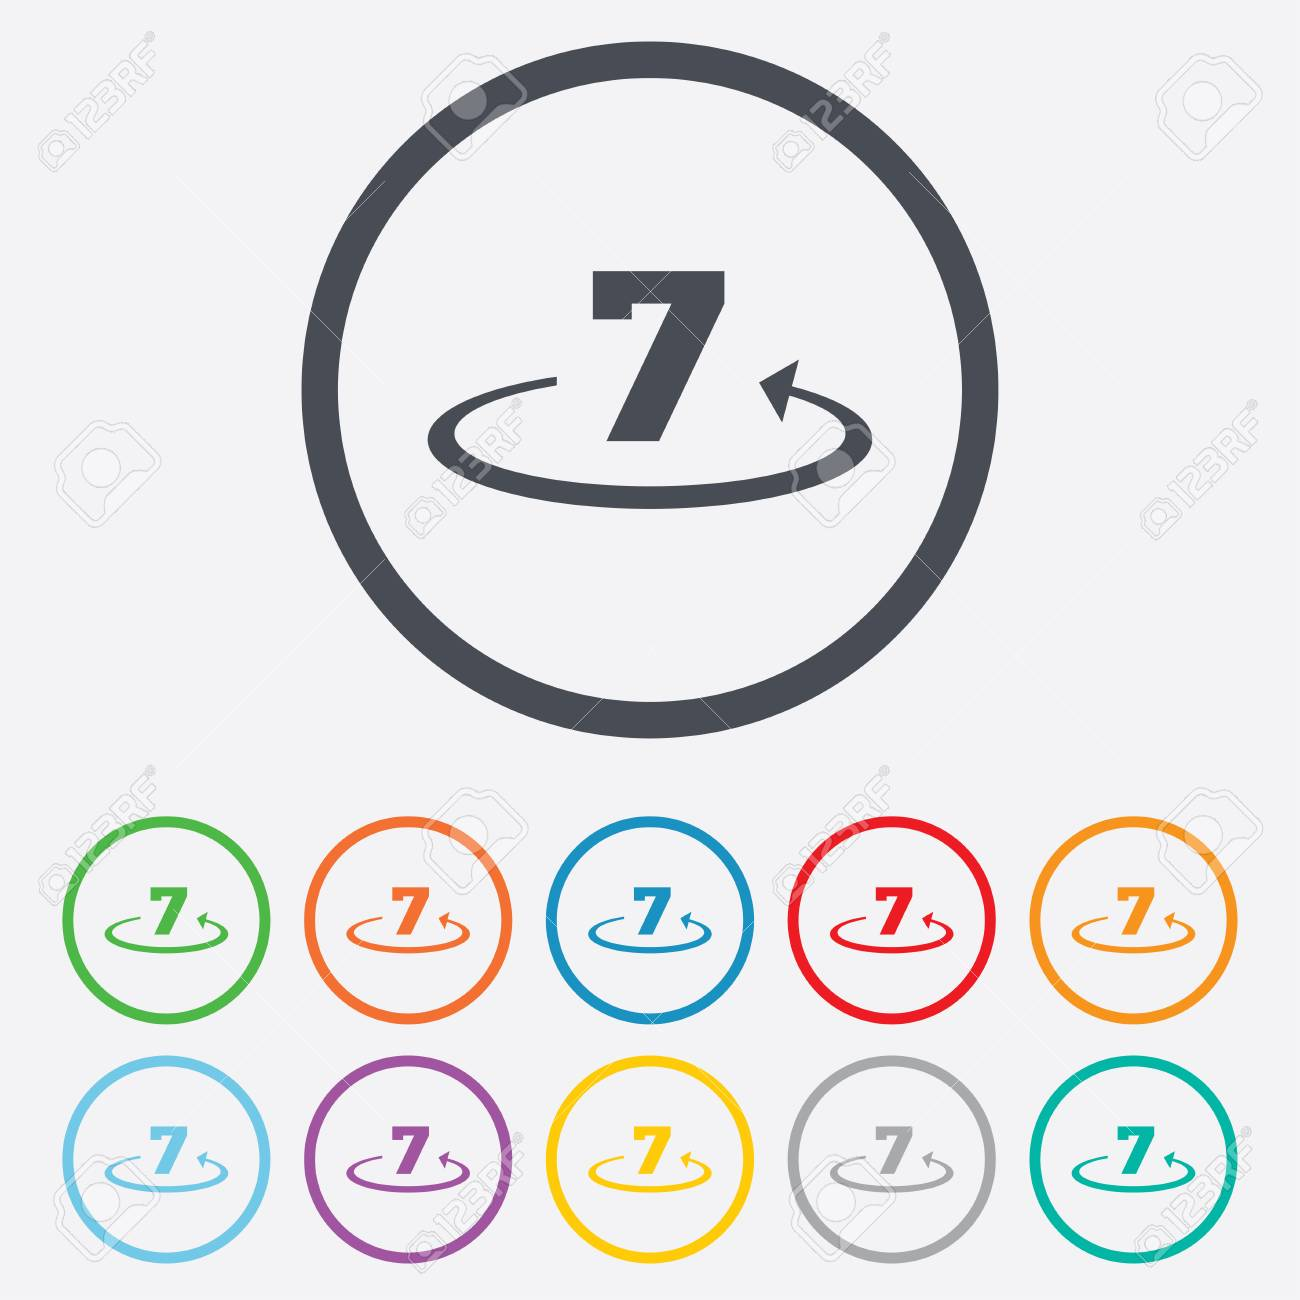 Return Of Goods Within 7 Days Sign Icon Warranty Exchange Symbol